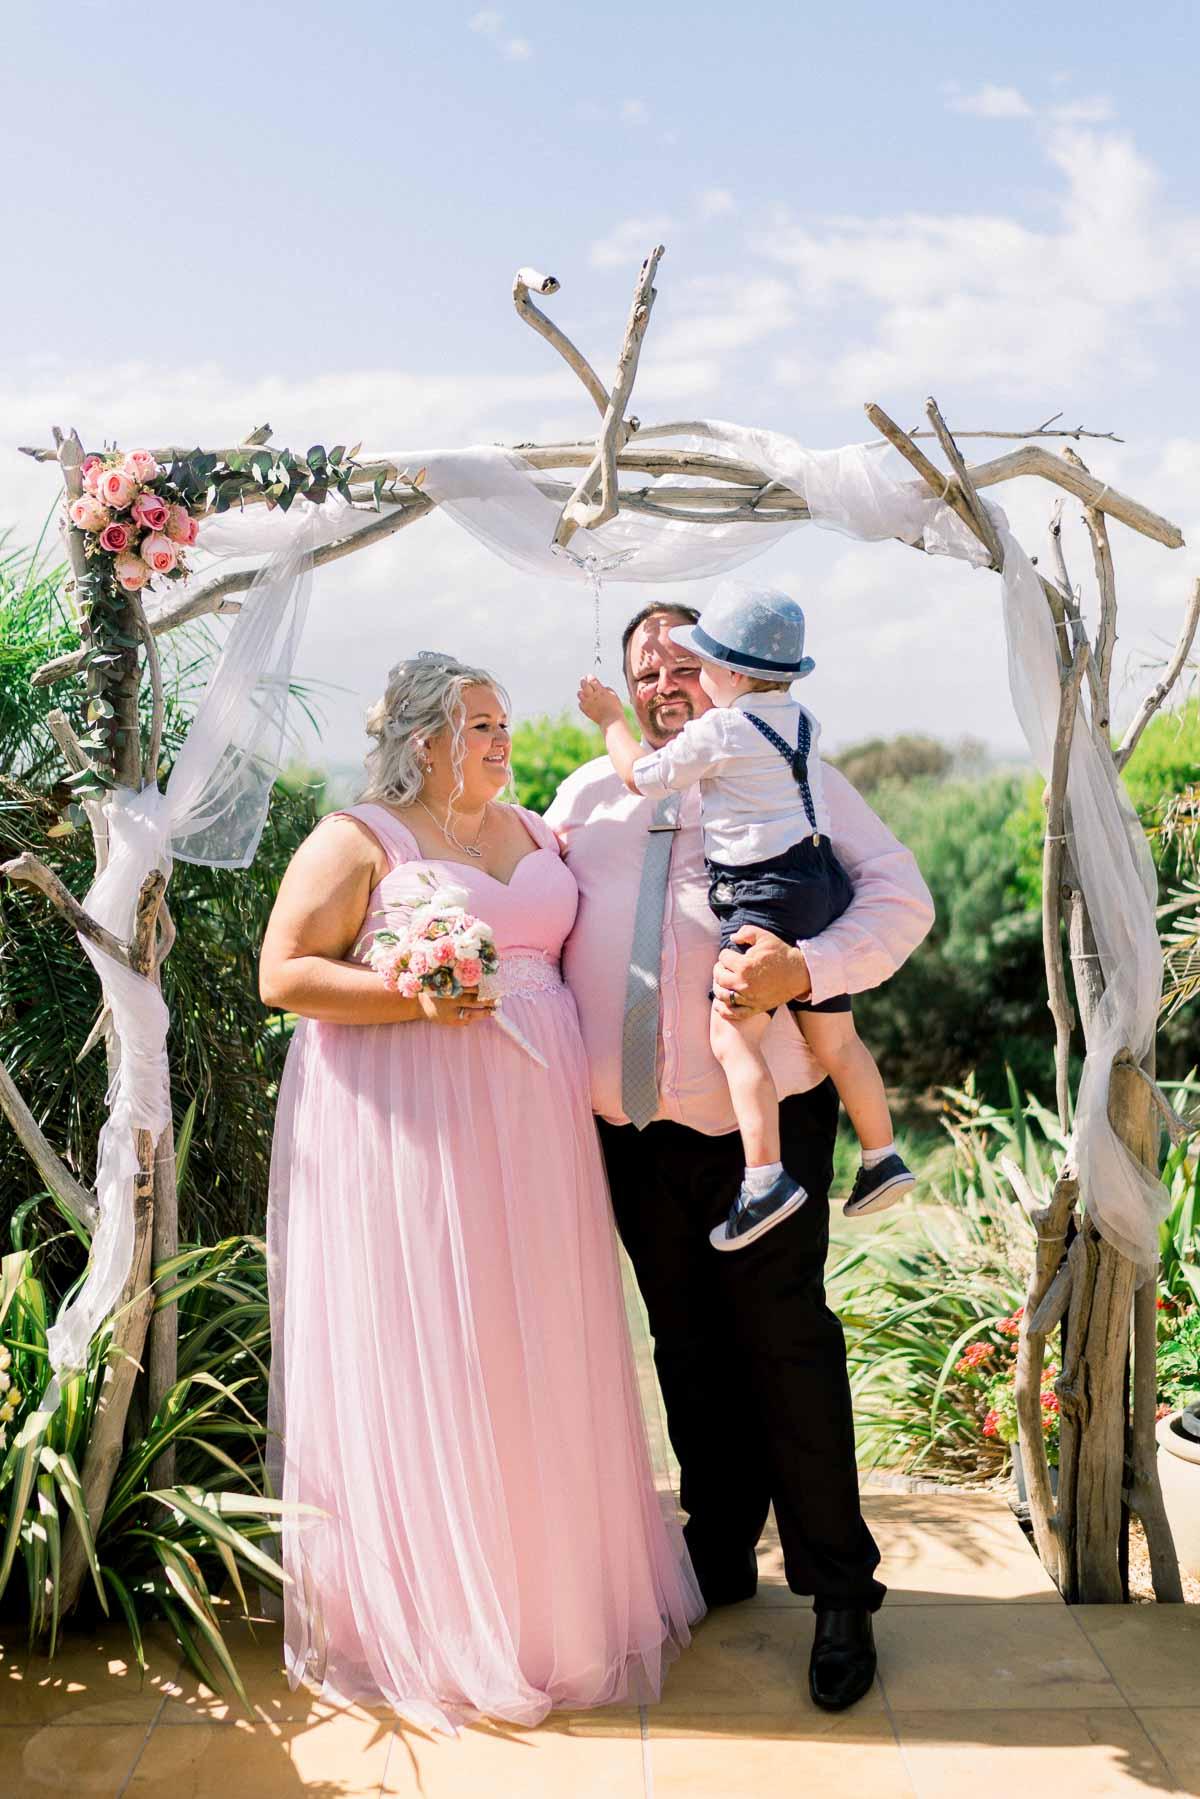 mt-eliza-mornington-peninsula-backyard-wedding-heart+soul-weddings-allison-matt-03407.jpg